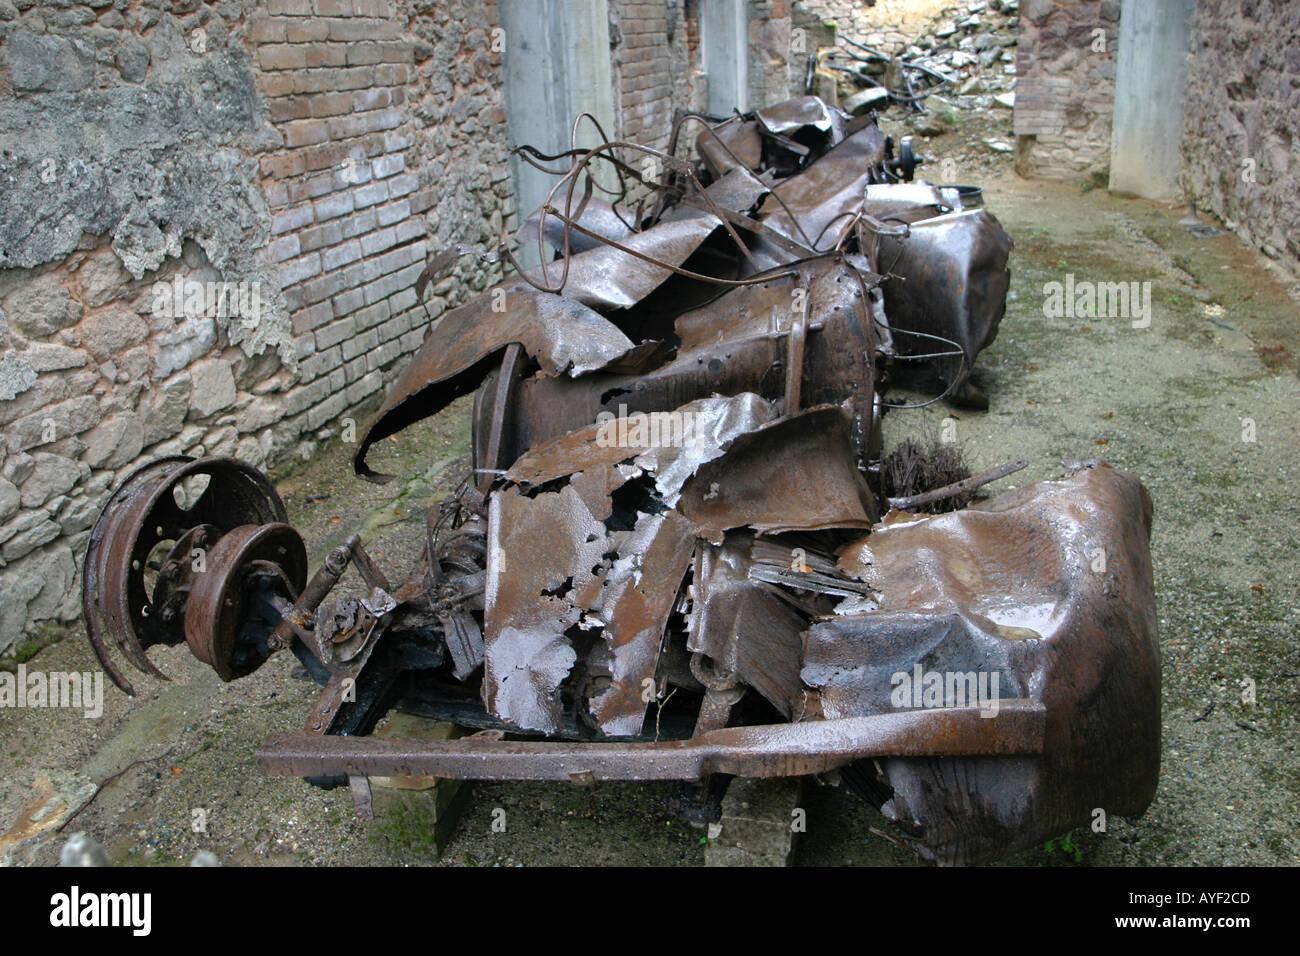 Car remains at Oradour sur Glane preserved Limousin village scene of WW2 Nazi SS massacre France - Stock Image